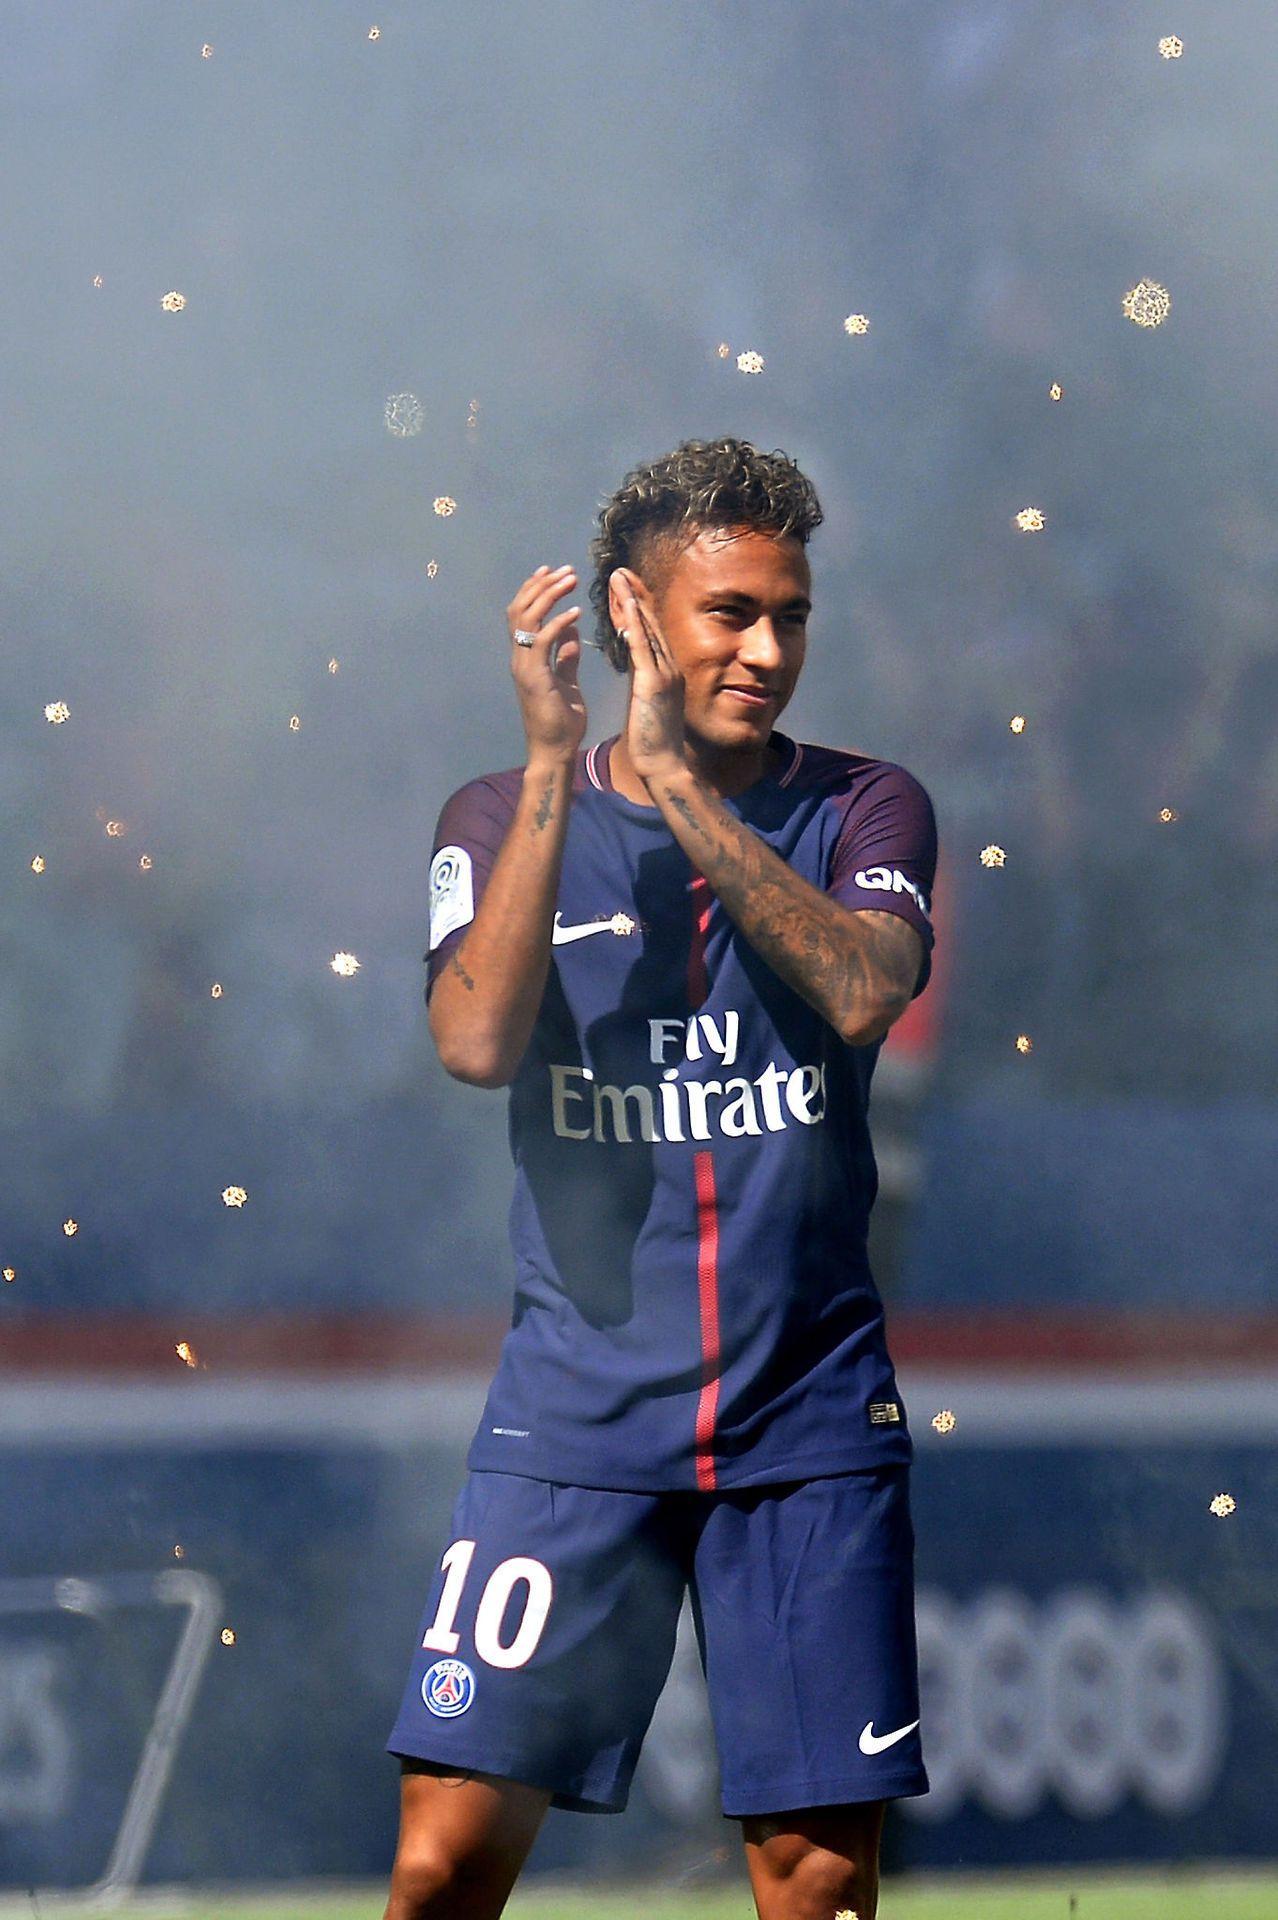 love the beautiful game Neymar PSG | Neymar psg, Neymar ...